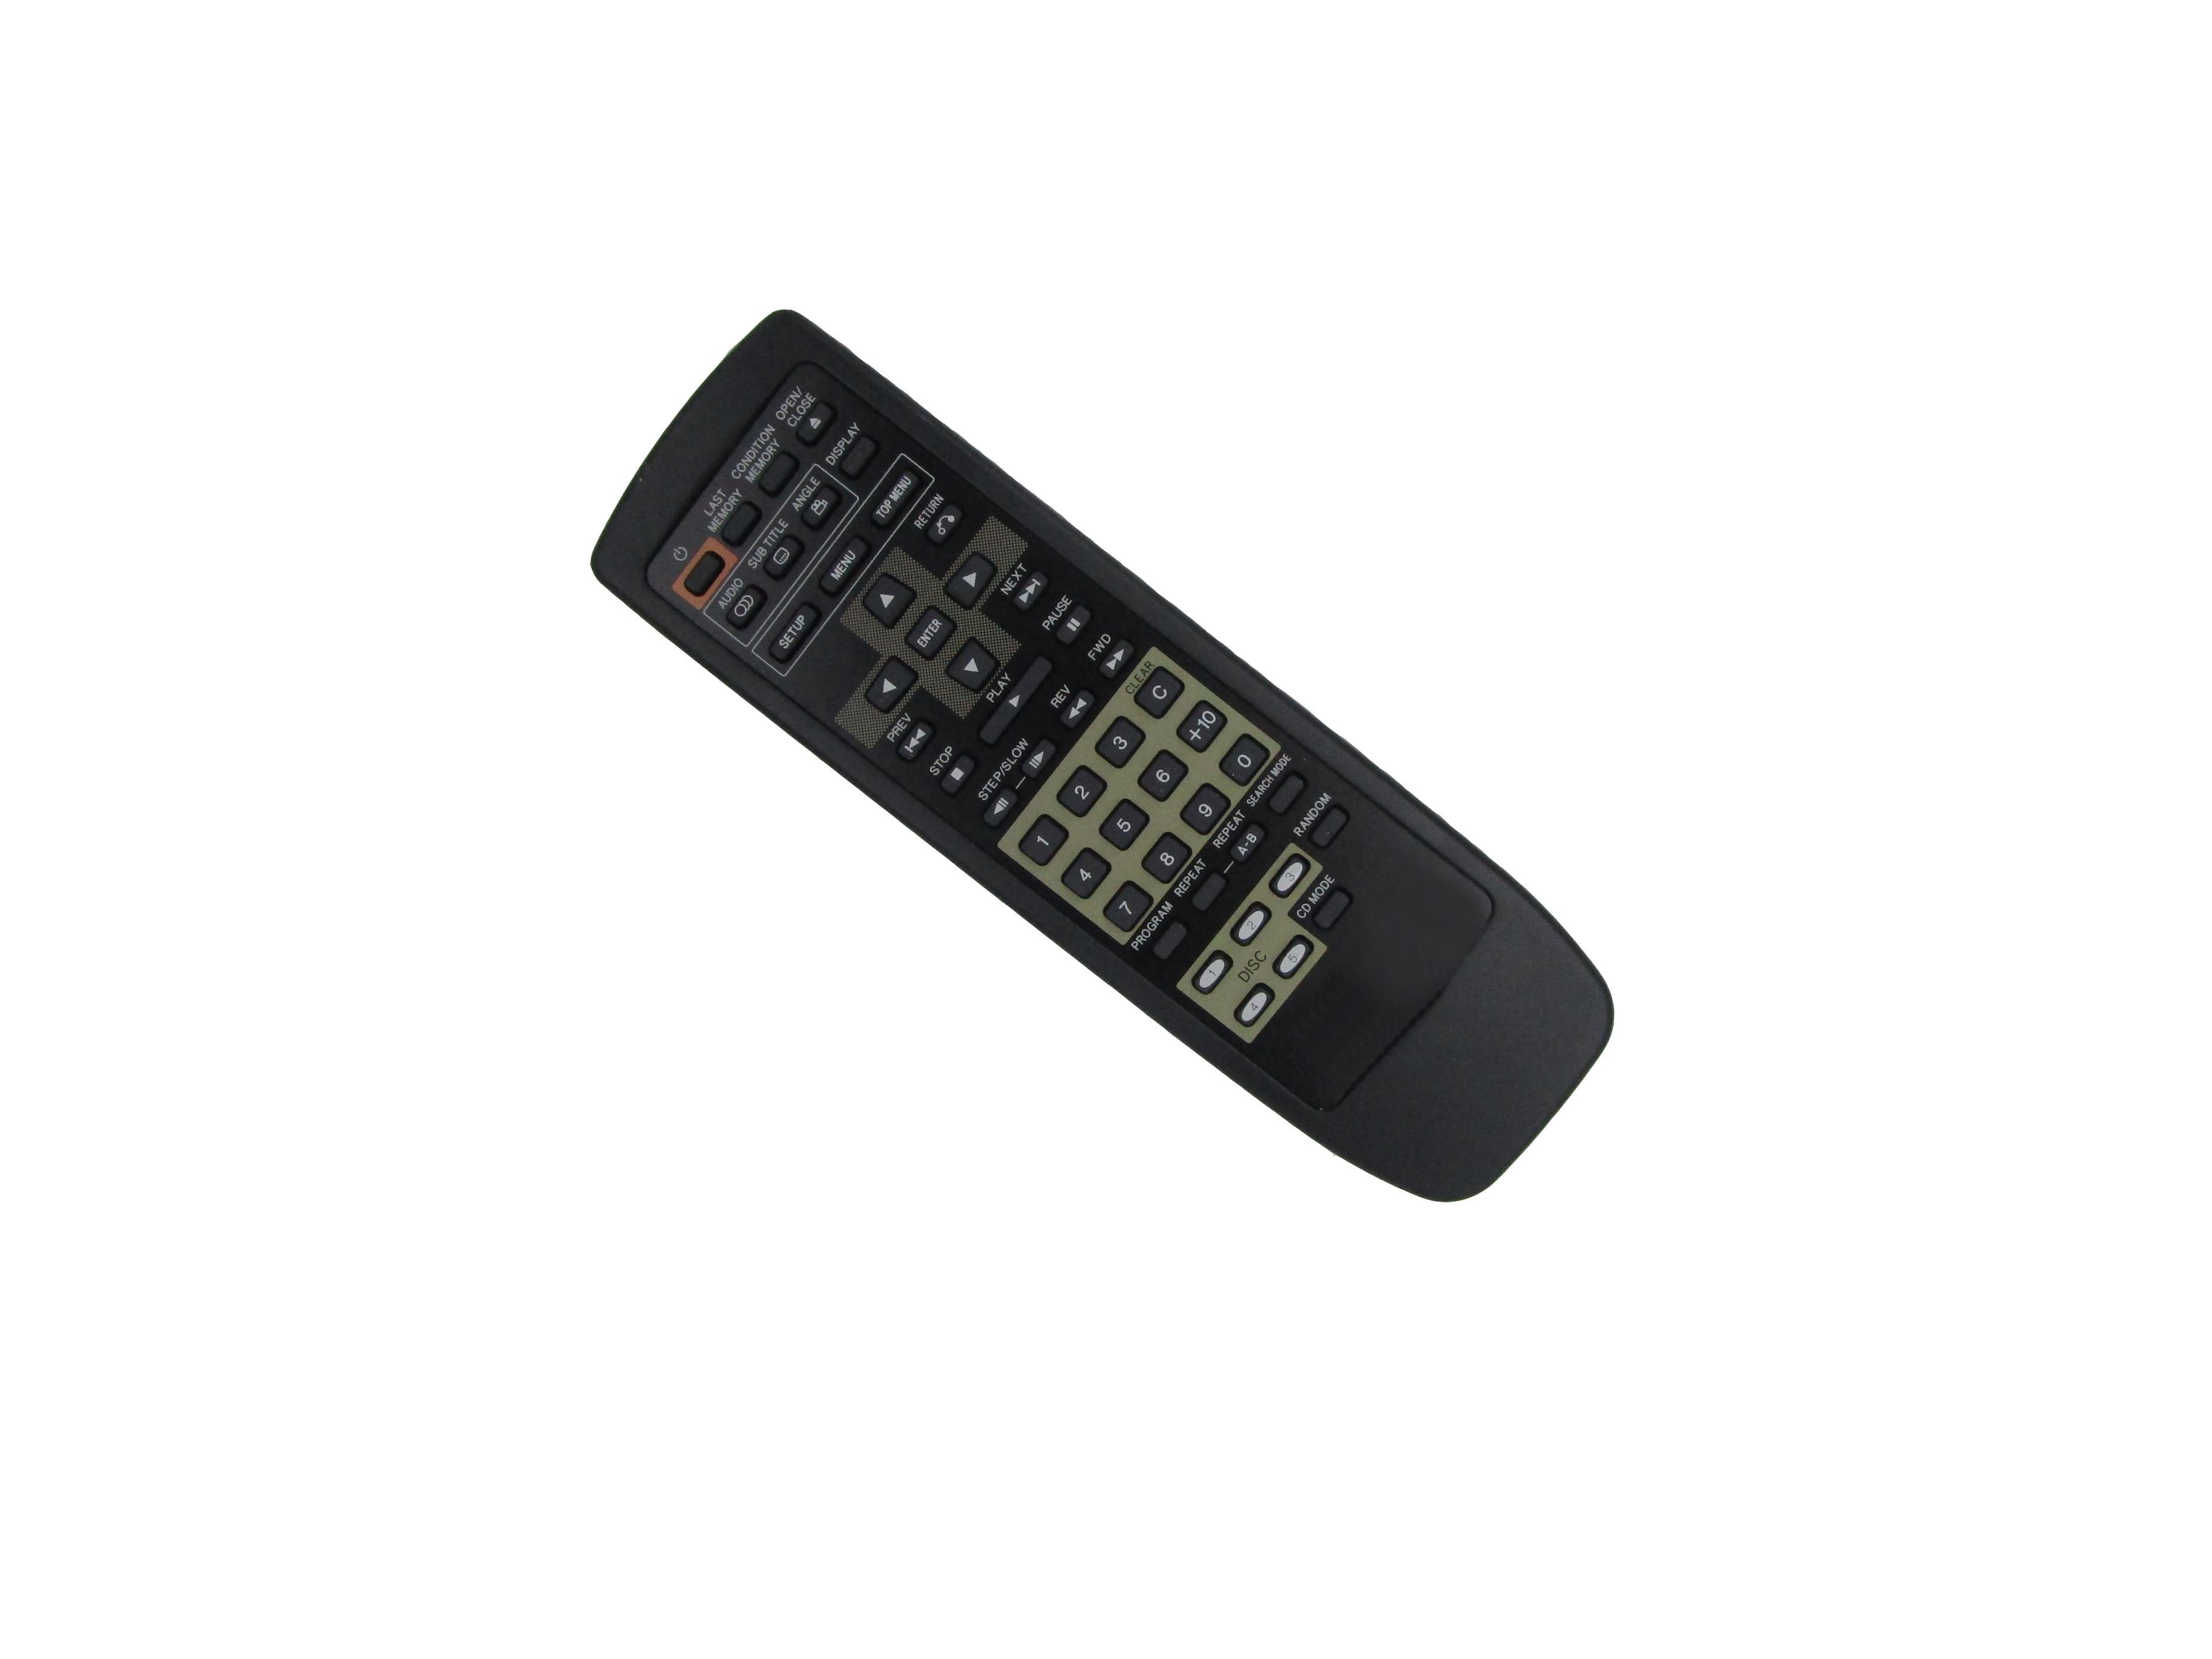 Mando a distancia para Pioneer CU-DV030, VXX2609, DVL-919 CU-DV051, VXX2625, CU-DV034, DVL-91, VXX2524, CD, reproductor cambiador de DVD